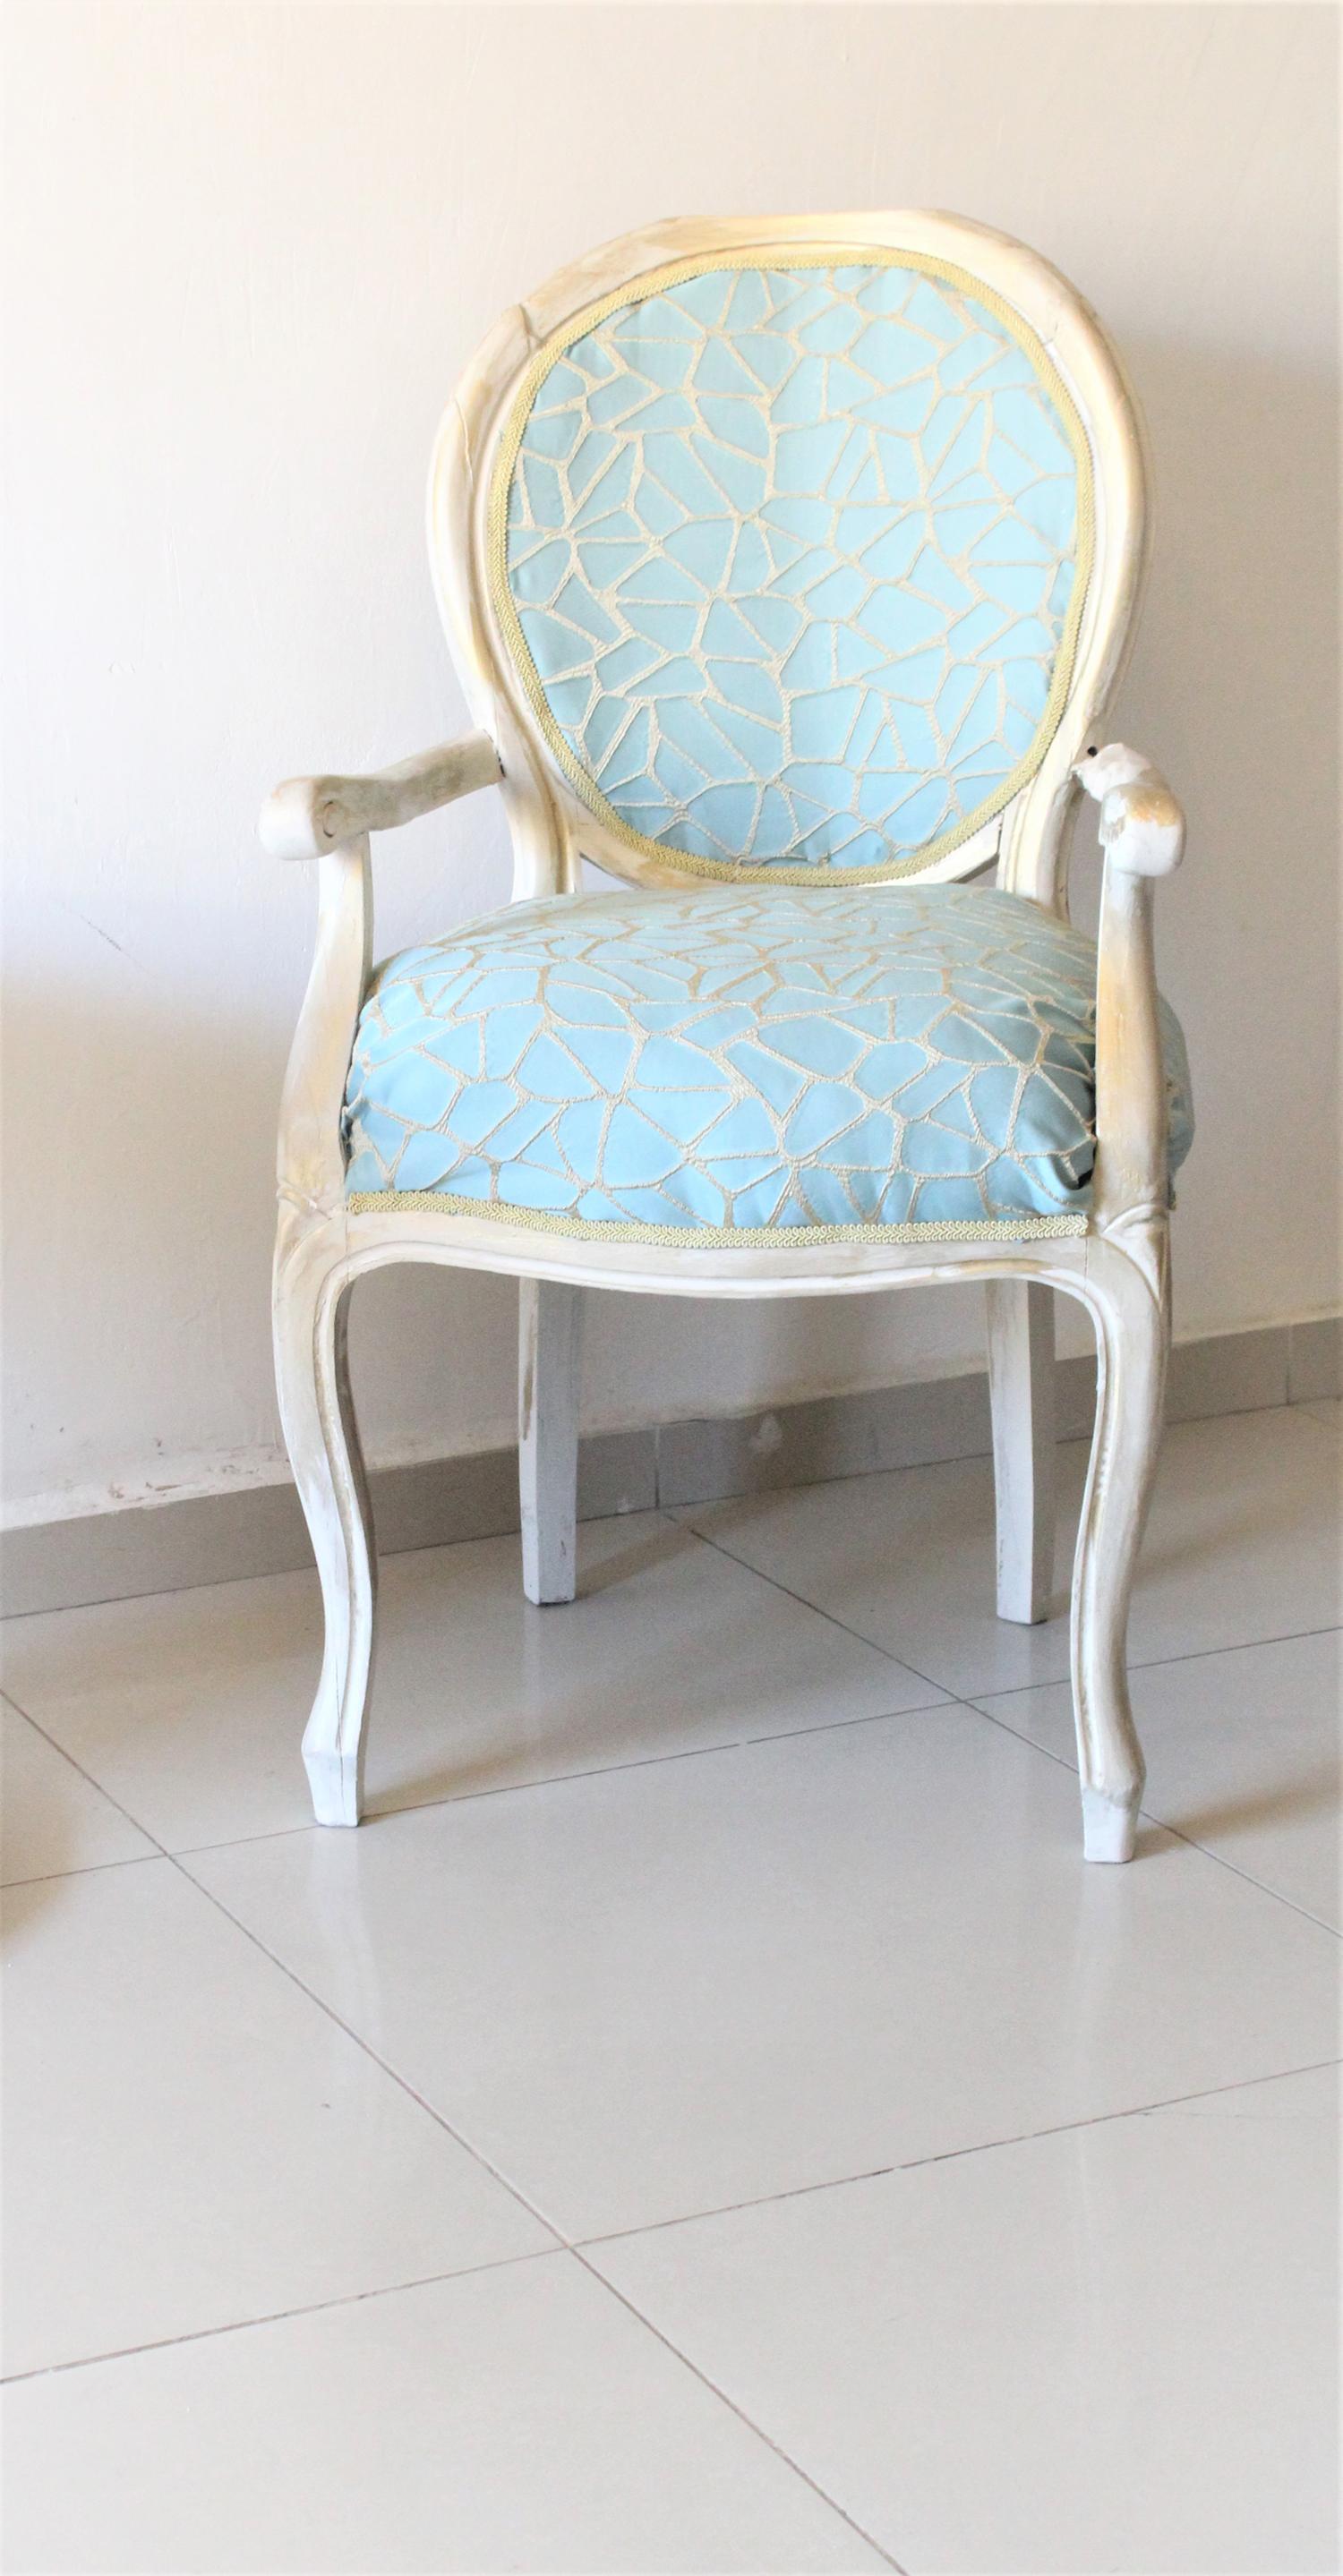 IMG 7414 - חידוש מחודש של שני כסאות